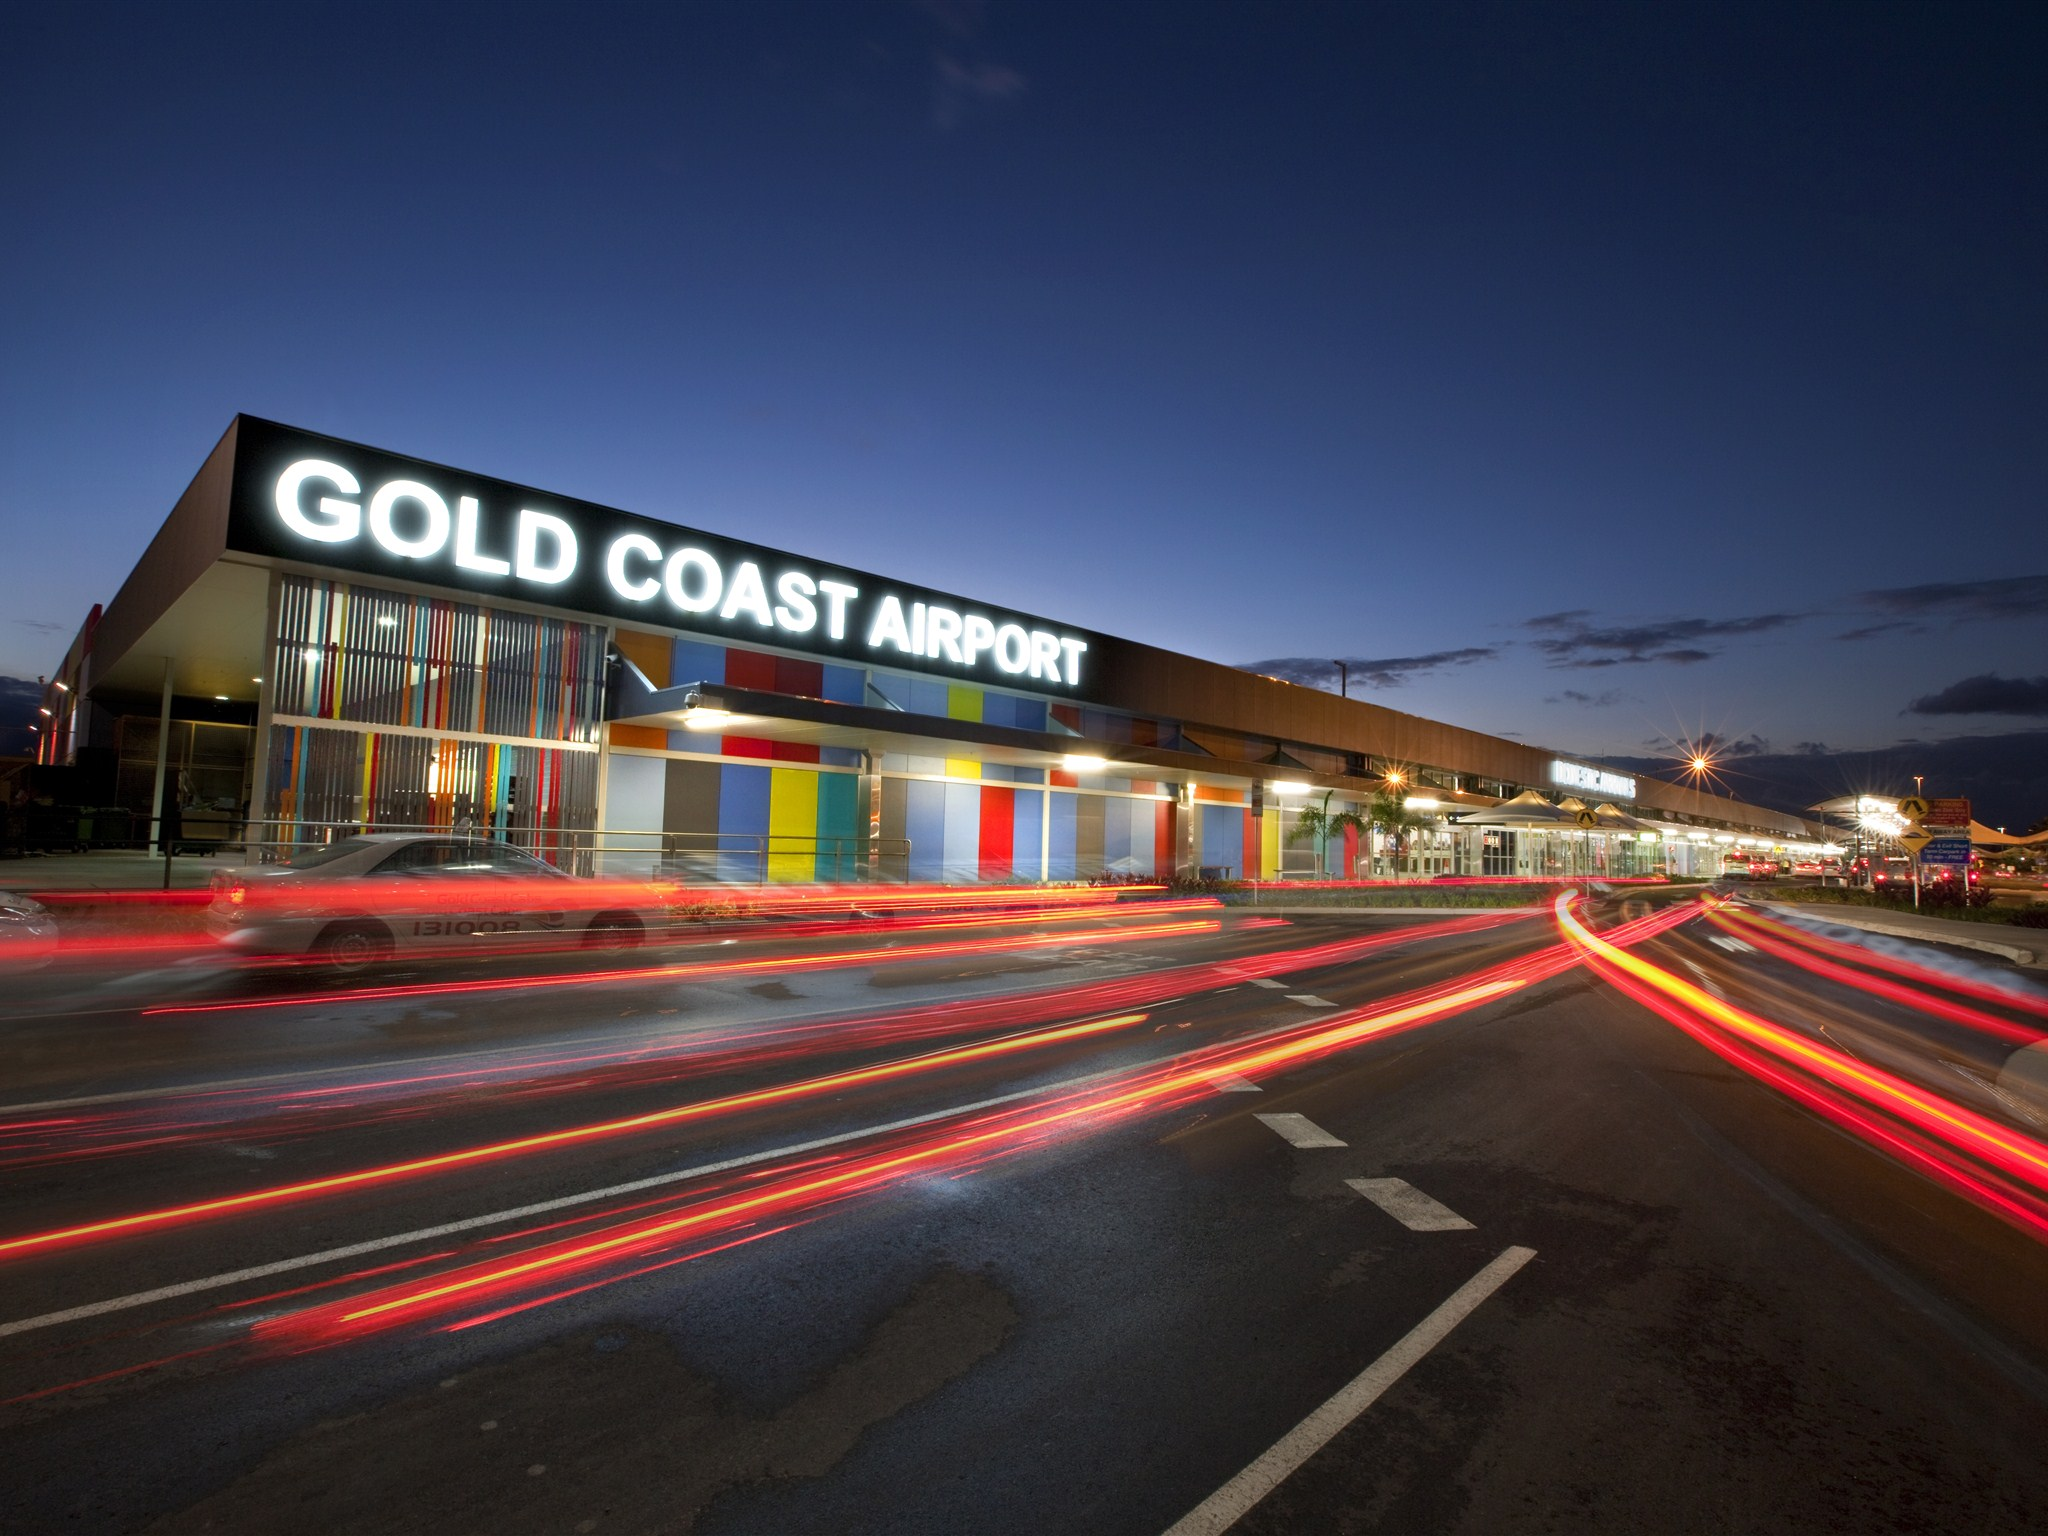 gold coast airport - Du lịch Gold Coast, 8 điều bạn cần PHẢI BIẾT